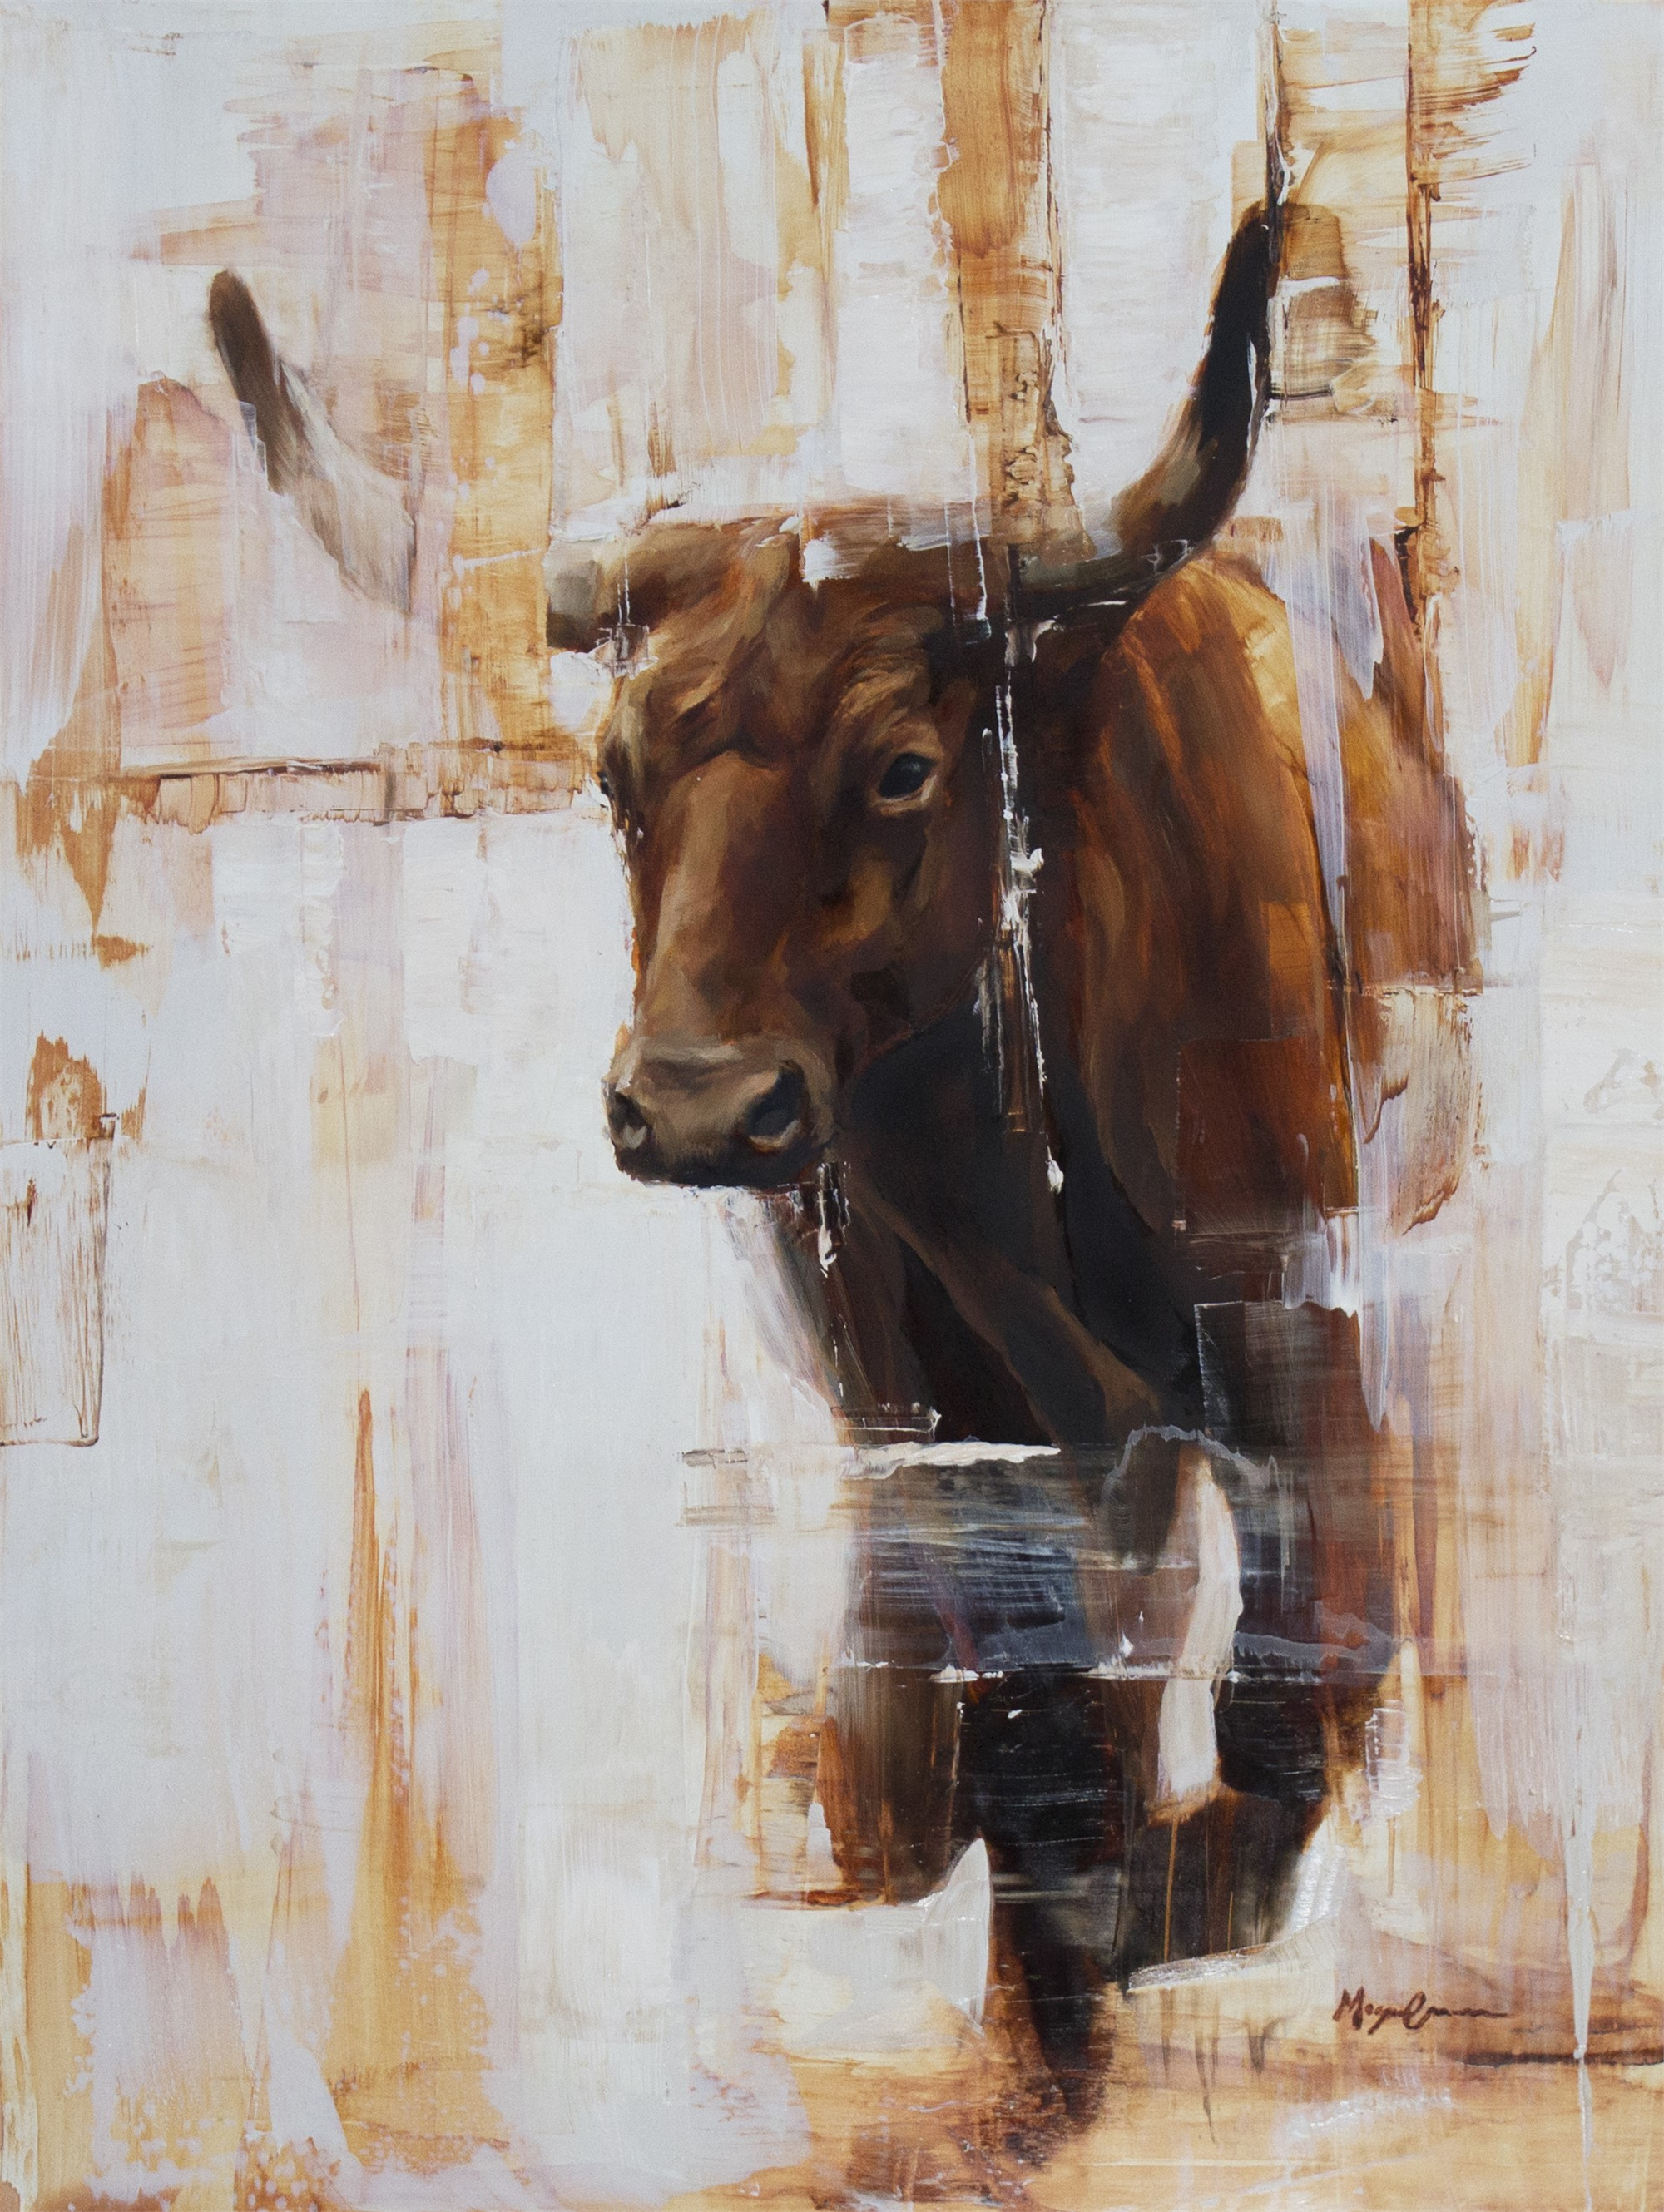 Red Steer by Morgan Cameron